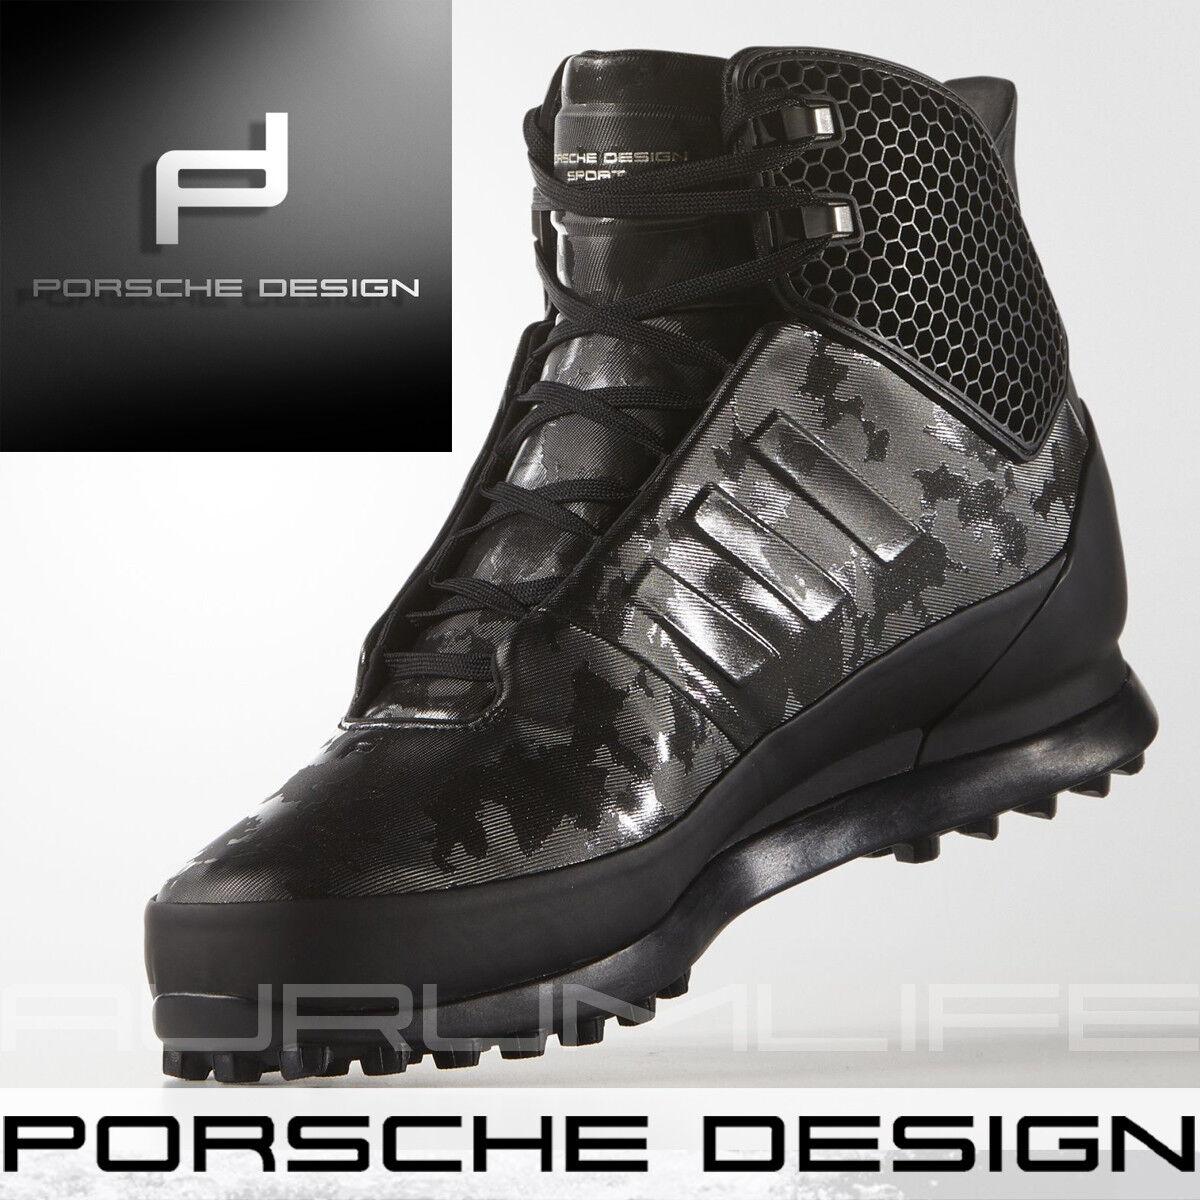 ADIDAS Scarpe Porsche Design Uomo Inverno Neve Neve Neve Bounce Tech Stivale Nero Taglia AQ3561 e070eb